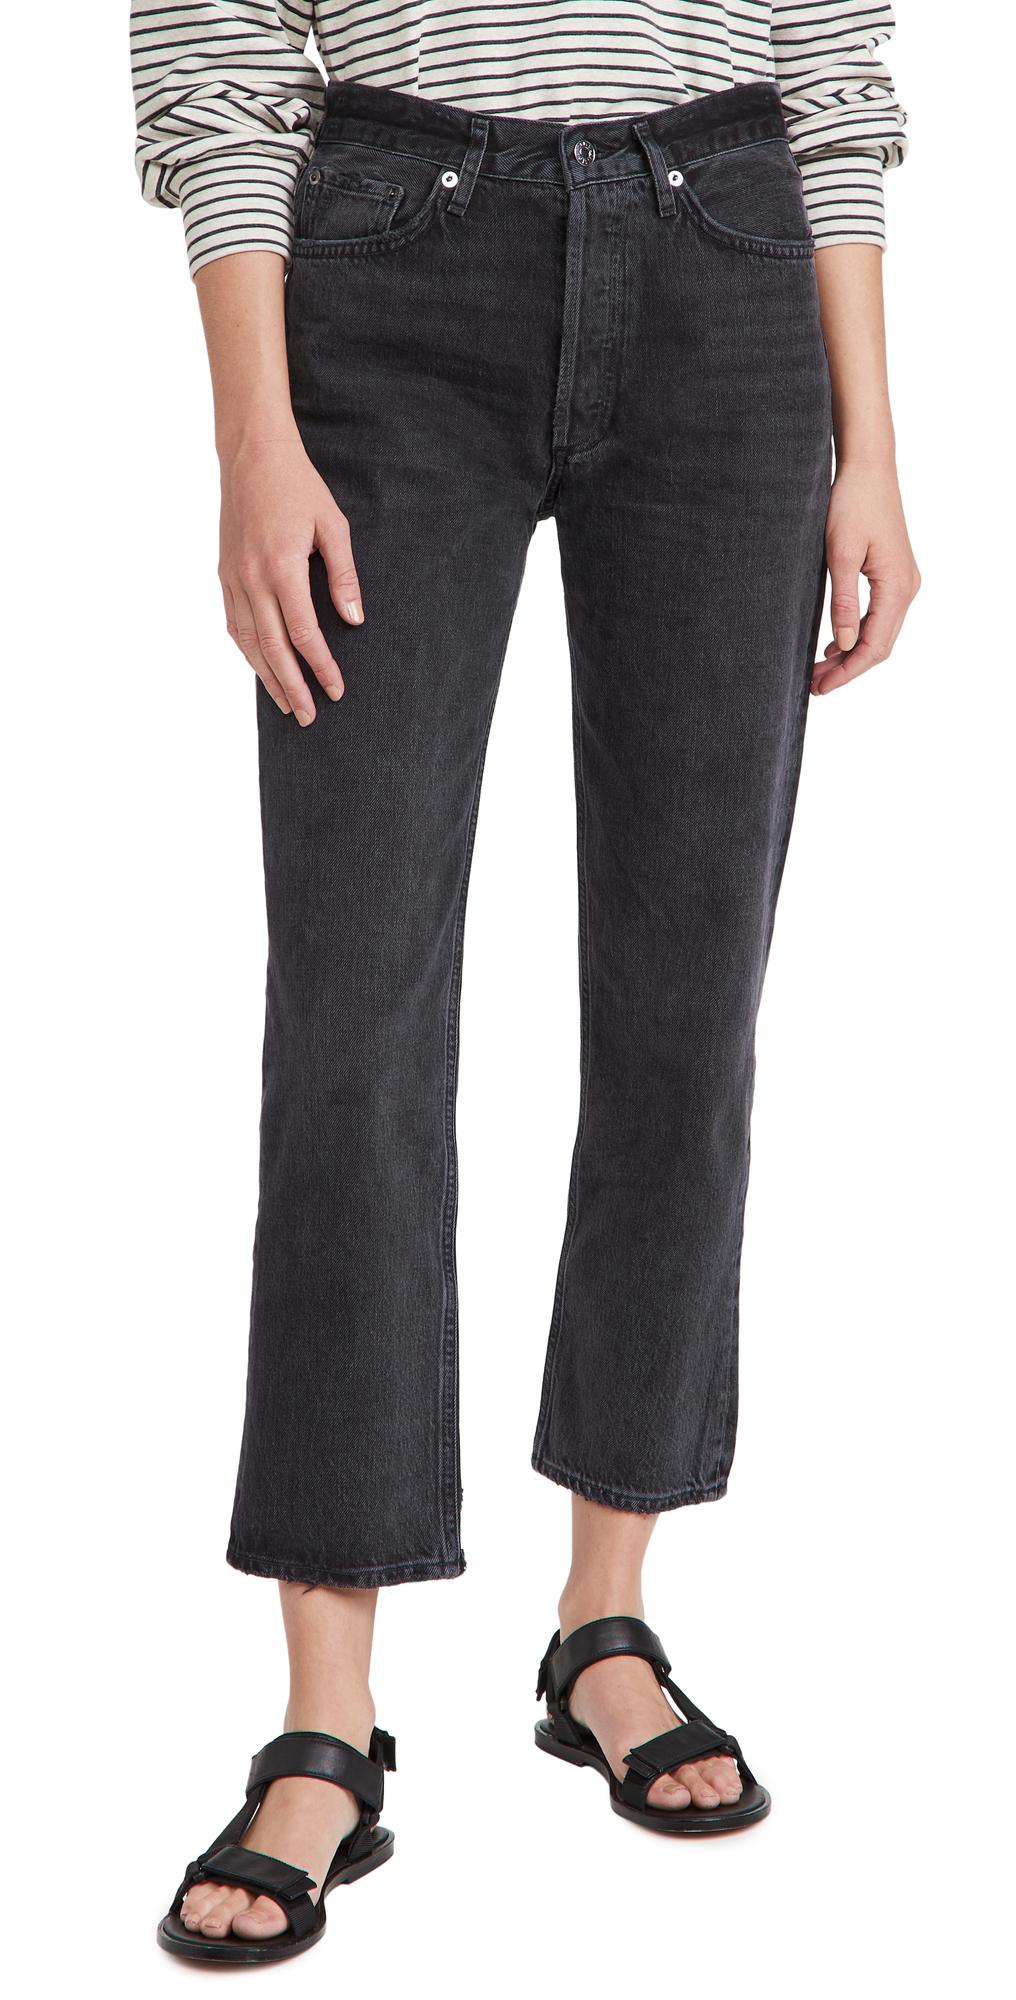 AGOLDE Lana Crop Jeans